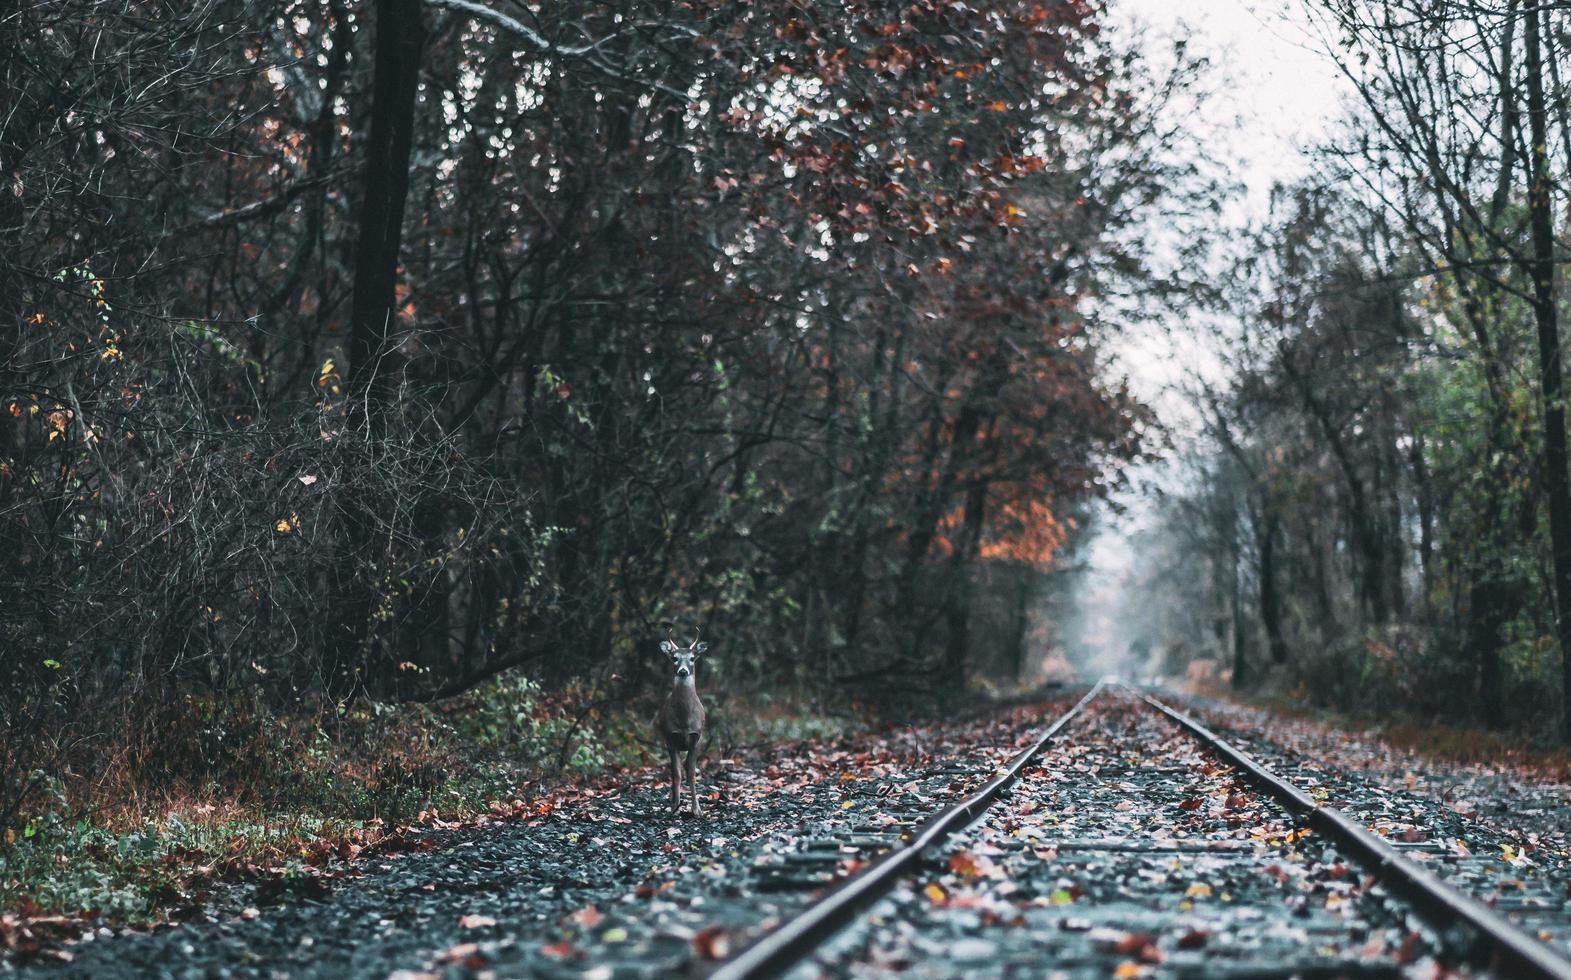 Deer standing near train tracks photo